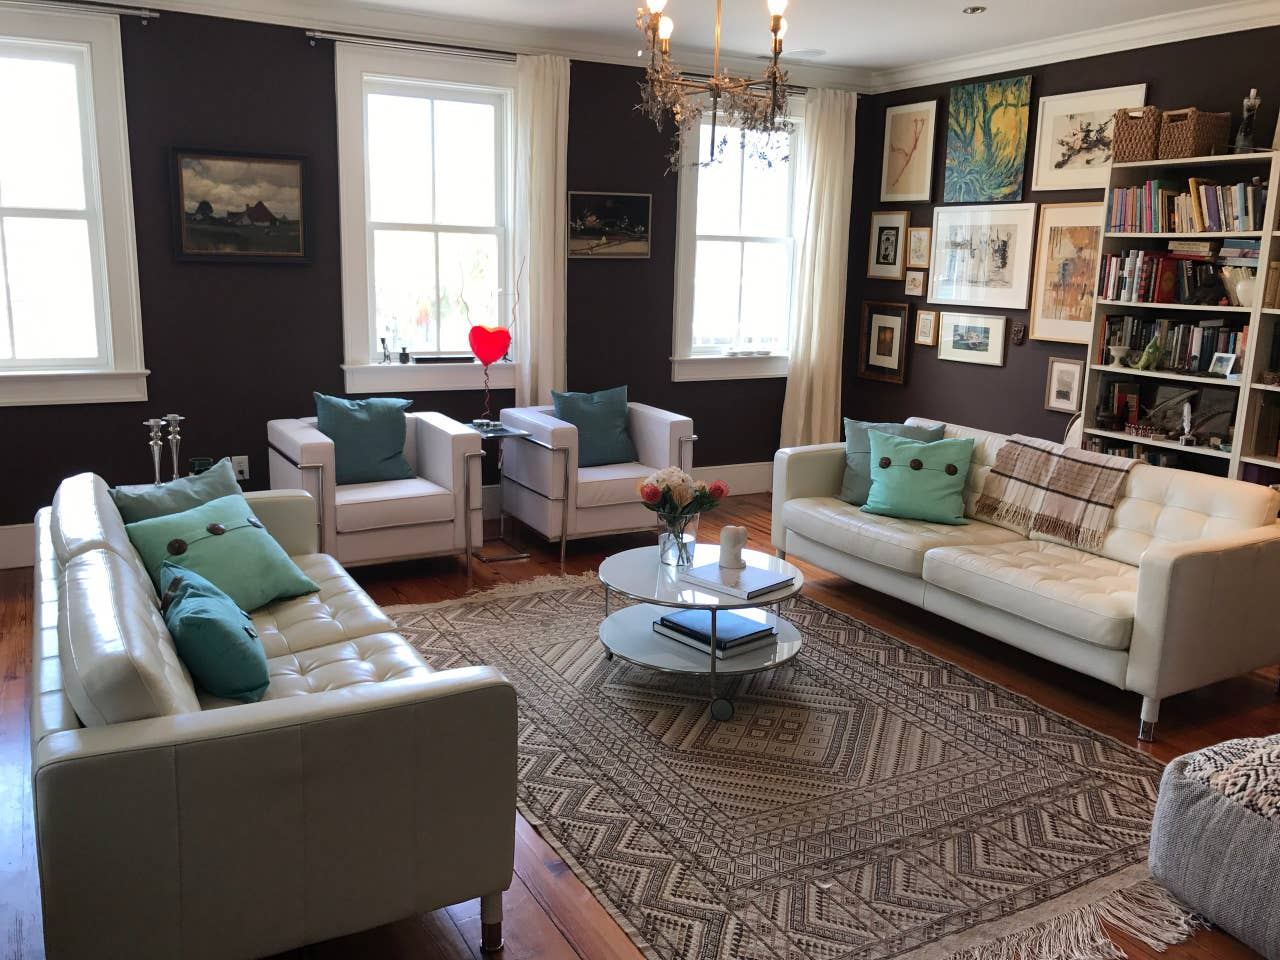 Charleston, SC Airbnb Home Rentals